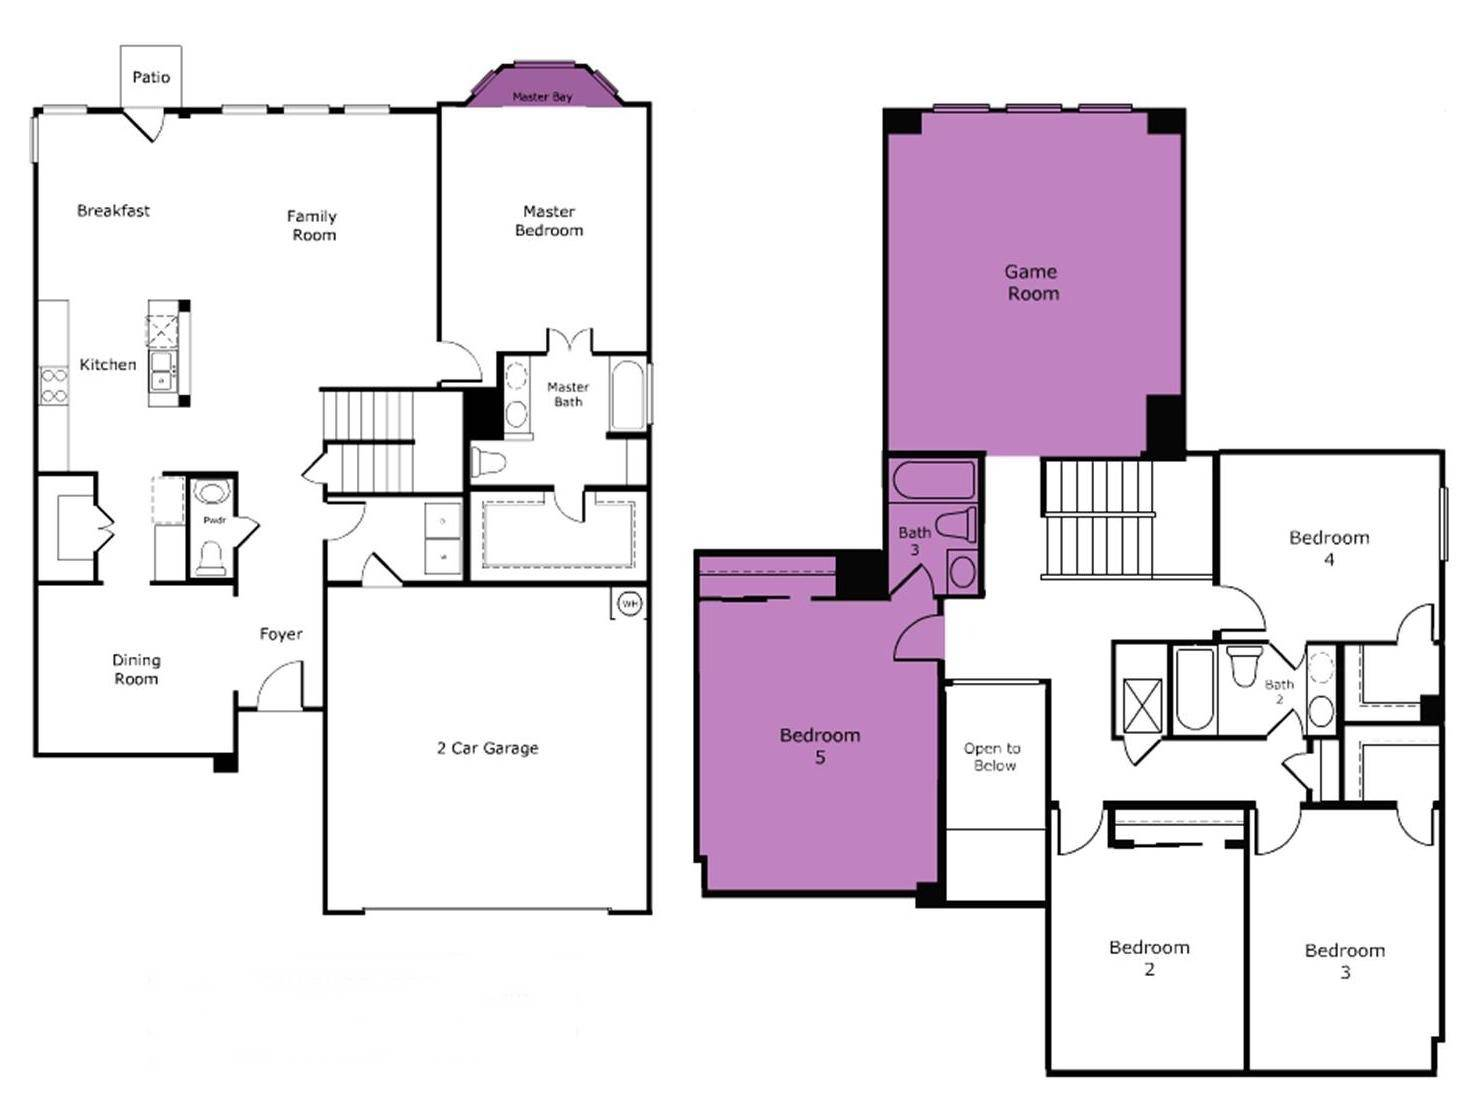 Floor Plans Room Addition 125284 Home Addition Drawing Plans Addition Home Plans Ideas Picture On Ranch